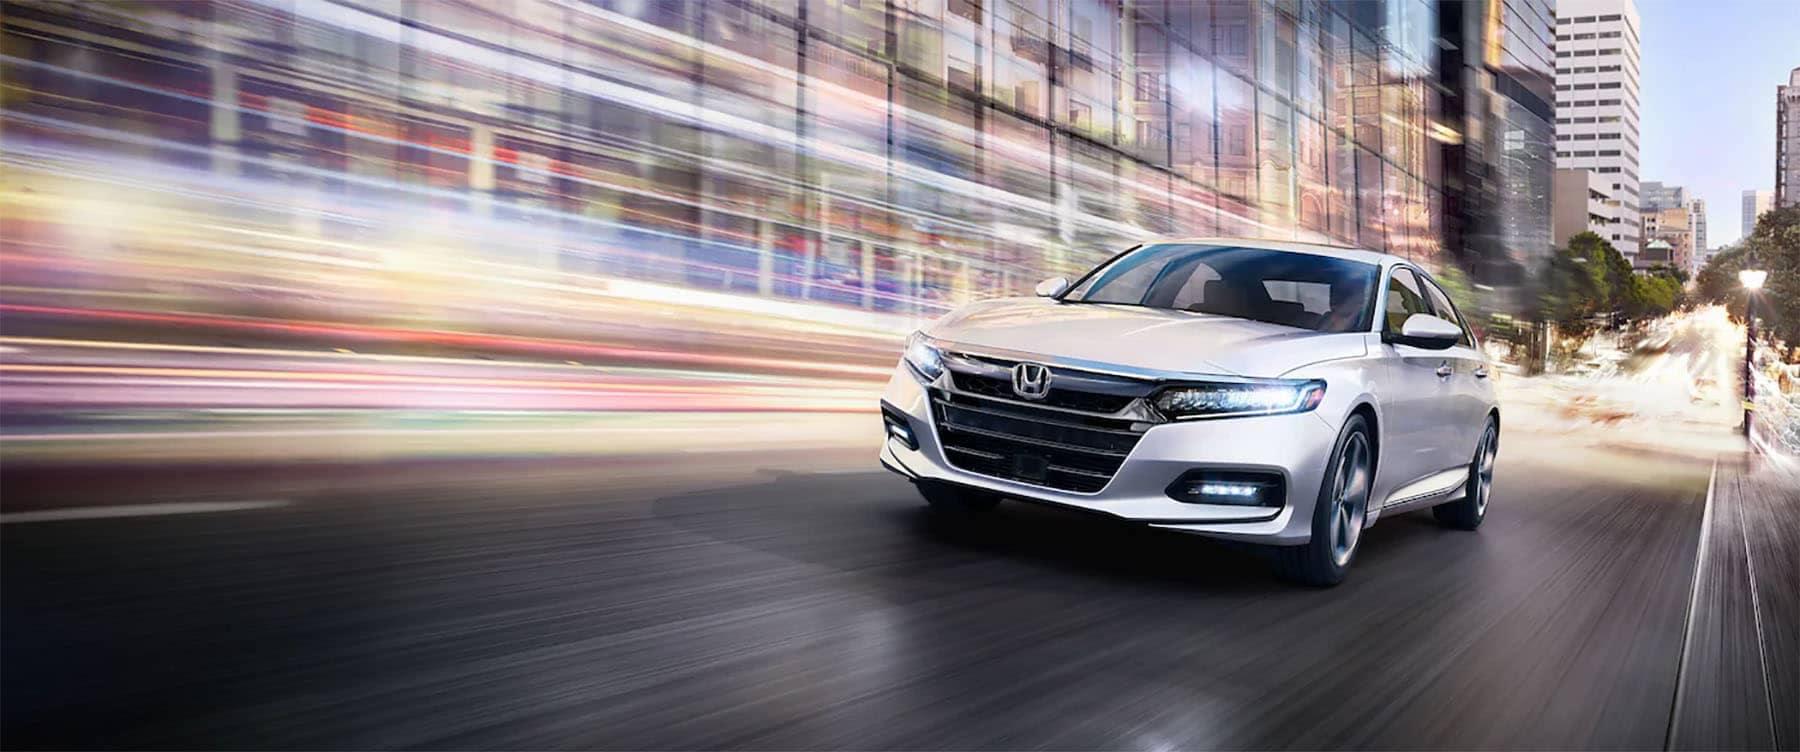 2019 Honda Accord Driving Through the City